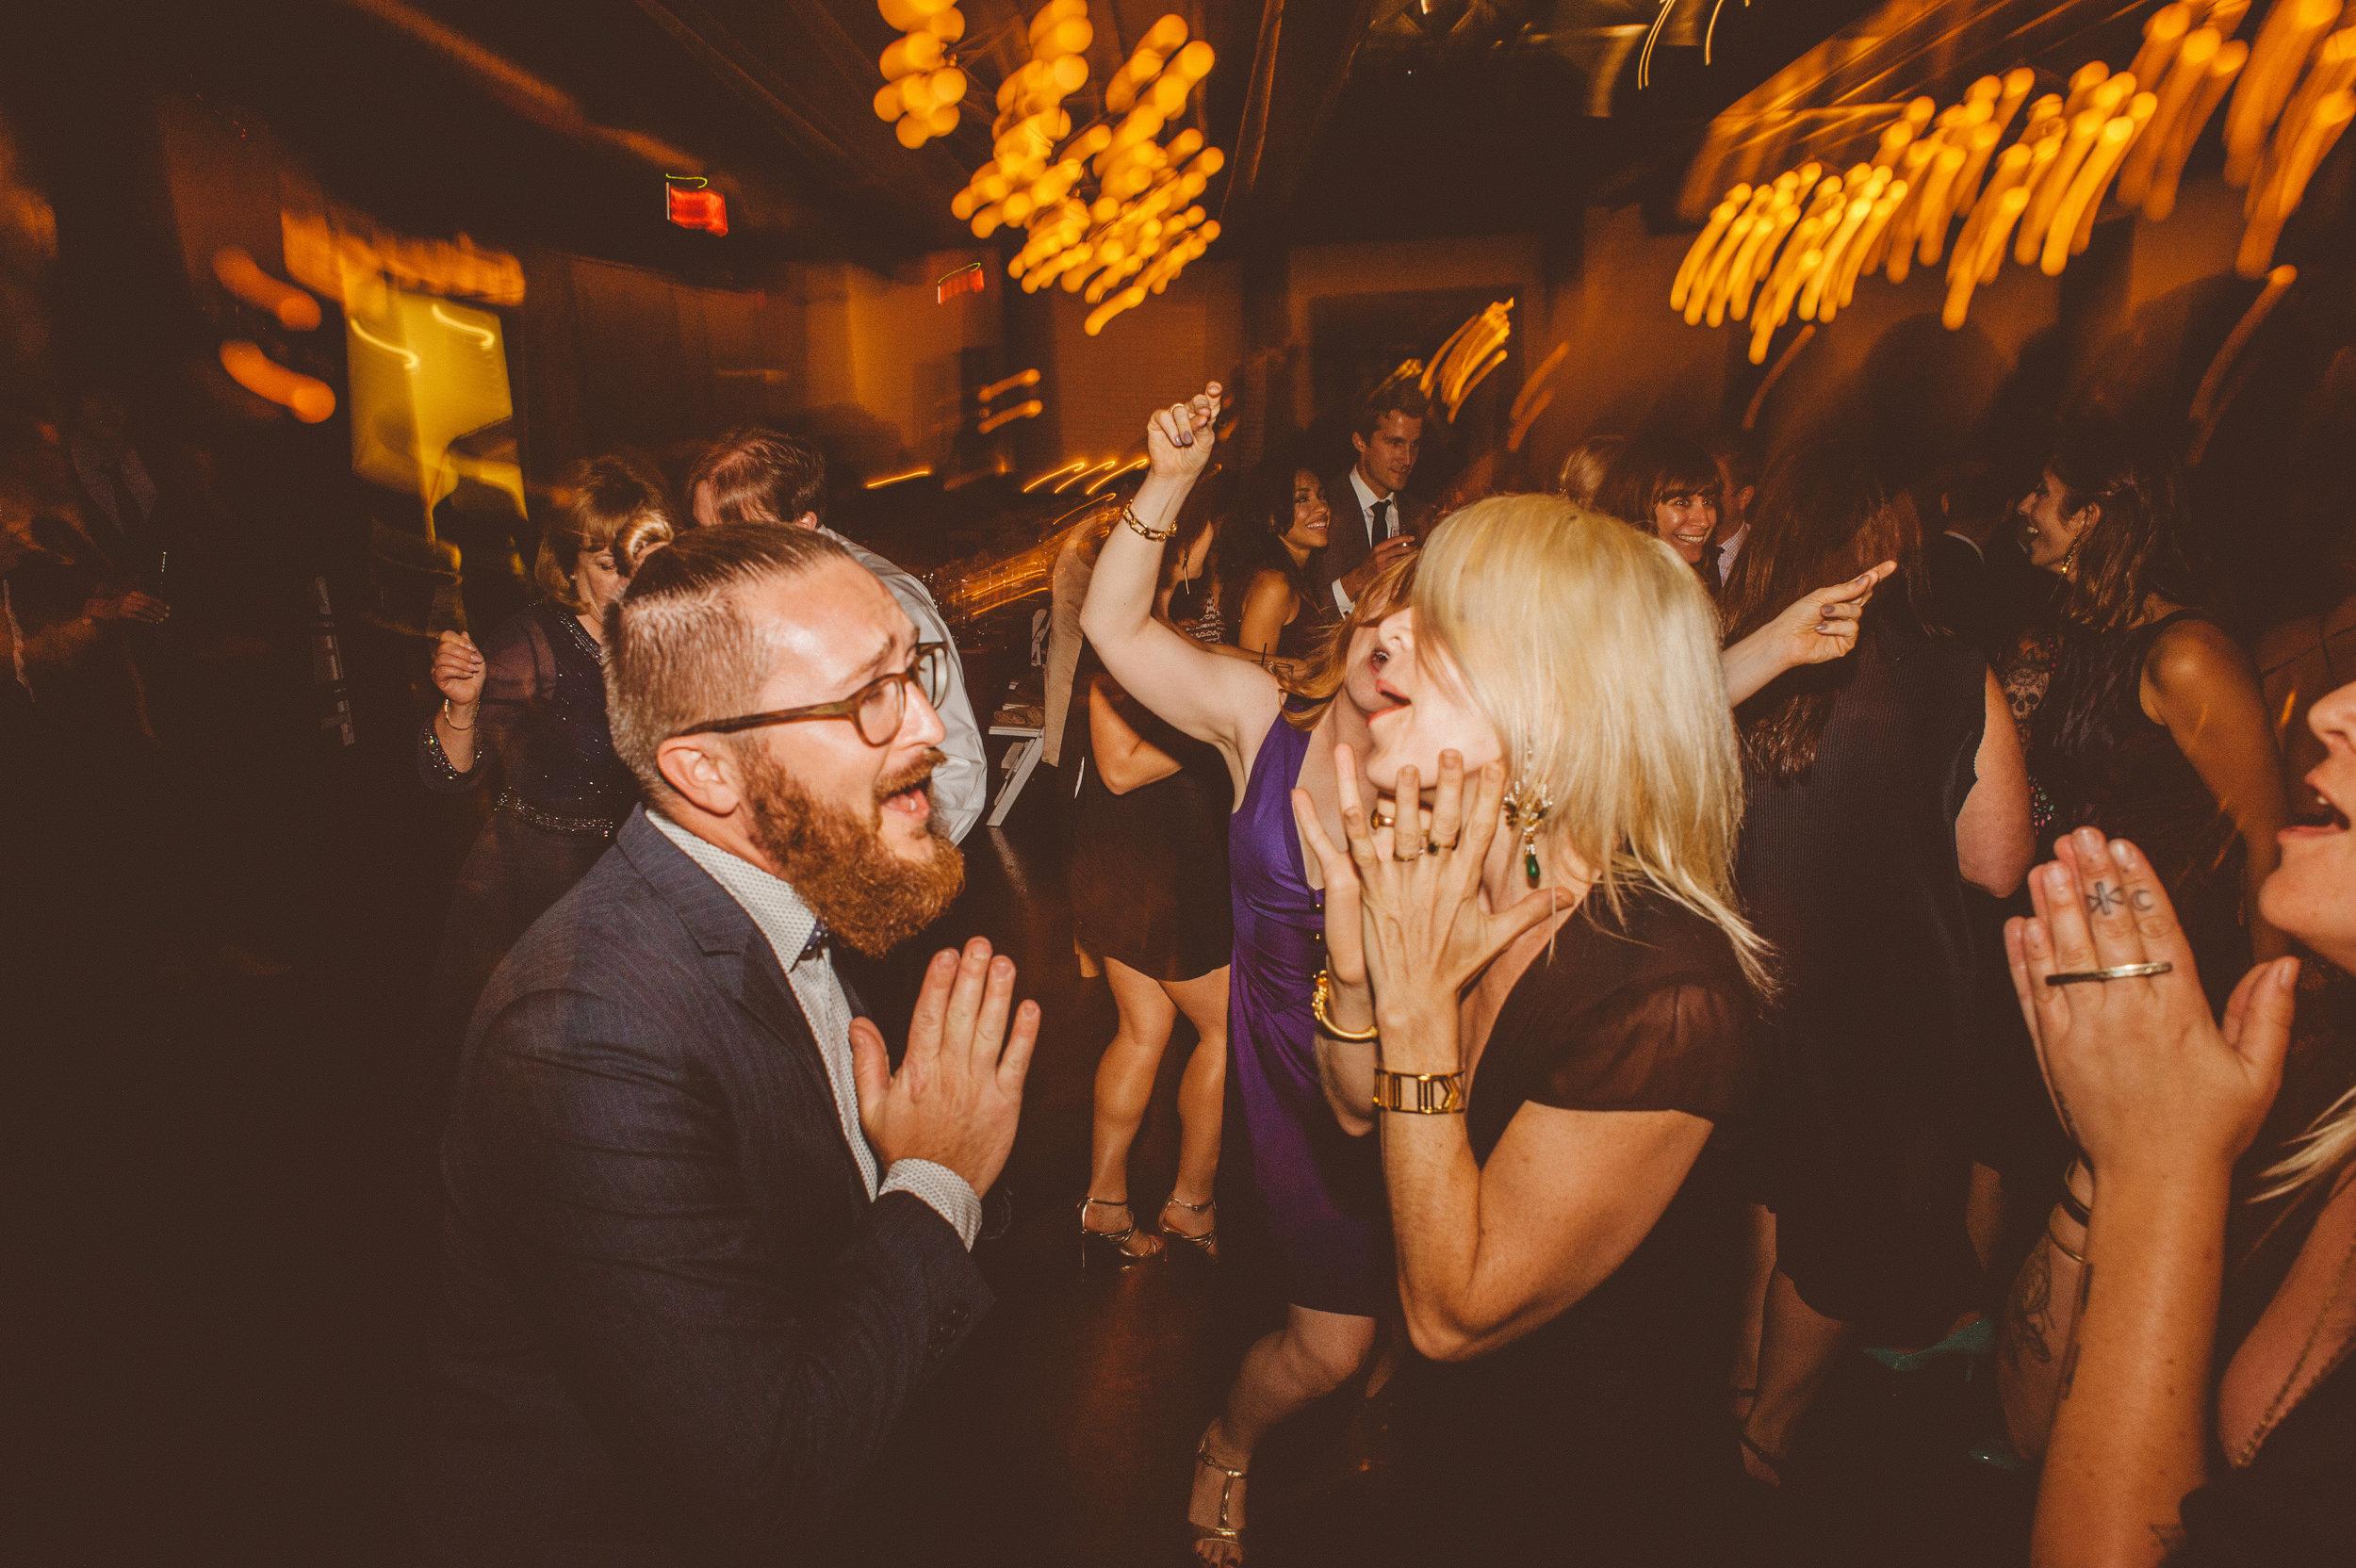 Jove taking a short dance break (he's got moves). photo by  Love + Wolves Co